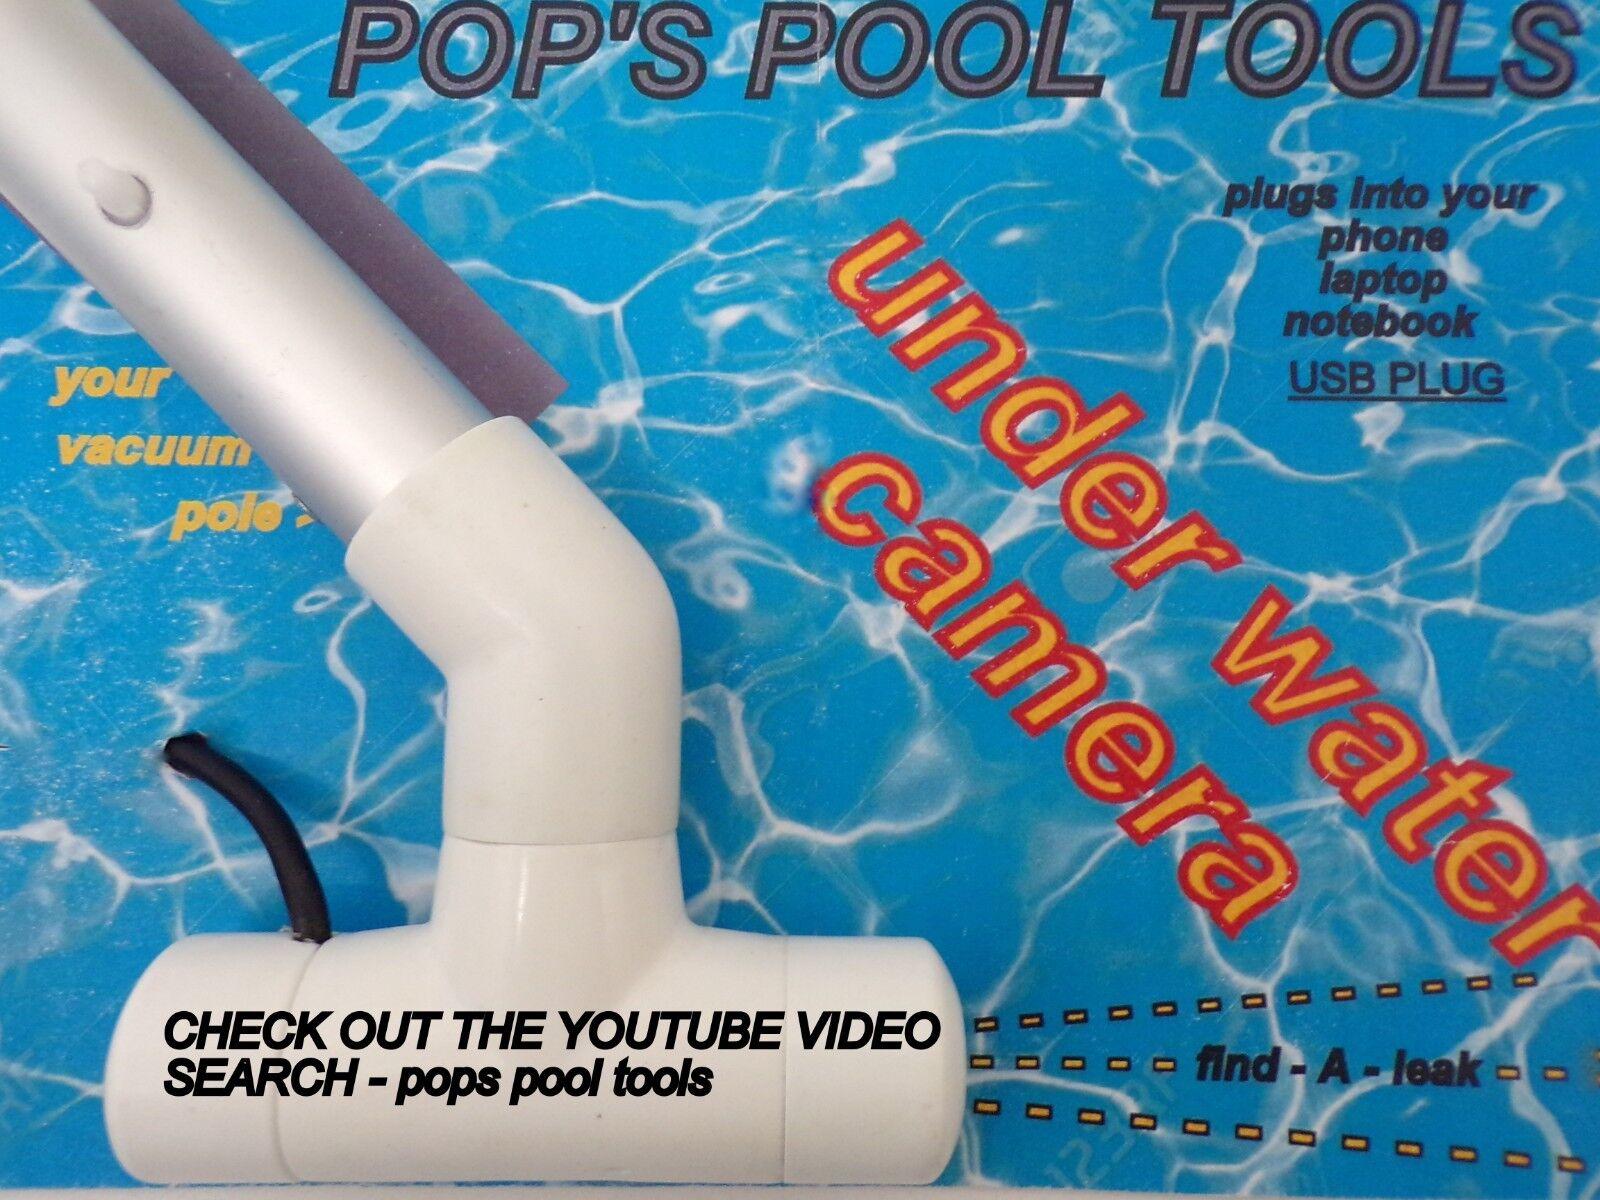 Cámara de fuga de piscina-piscina Detector De Fugas-piscina-piscina de fugas buscador de fugas